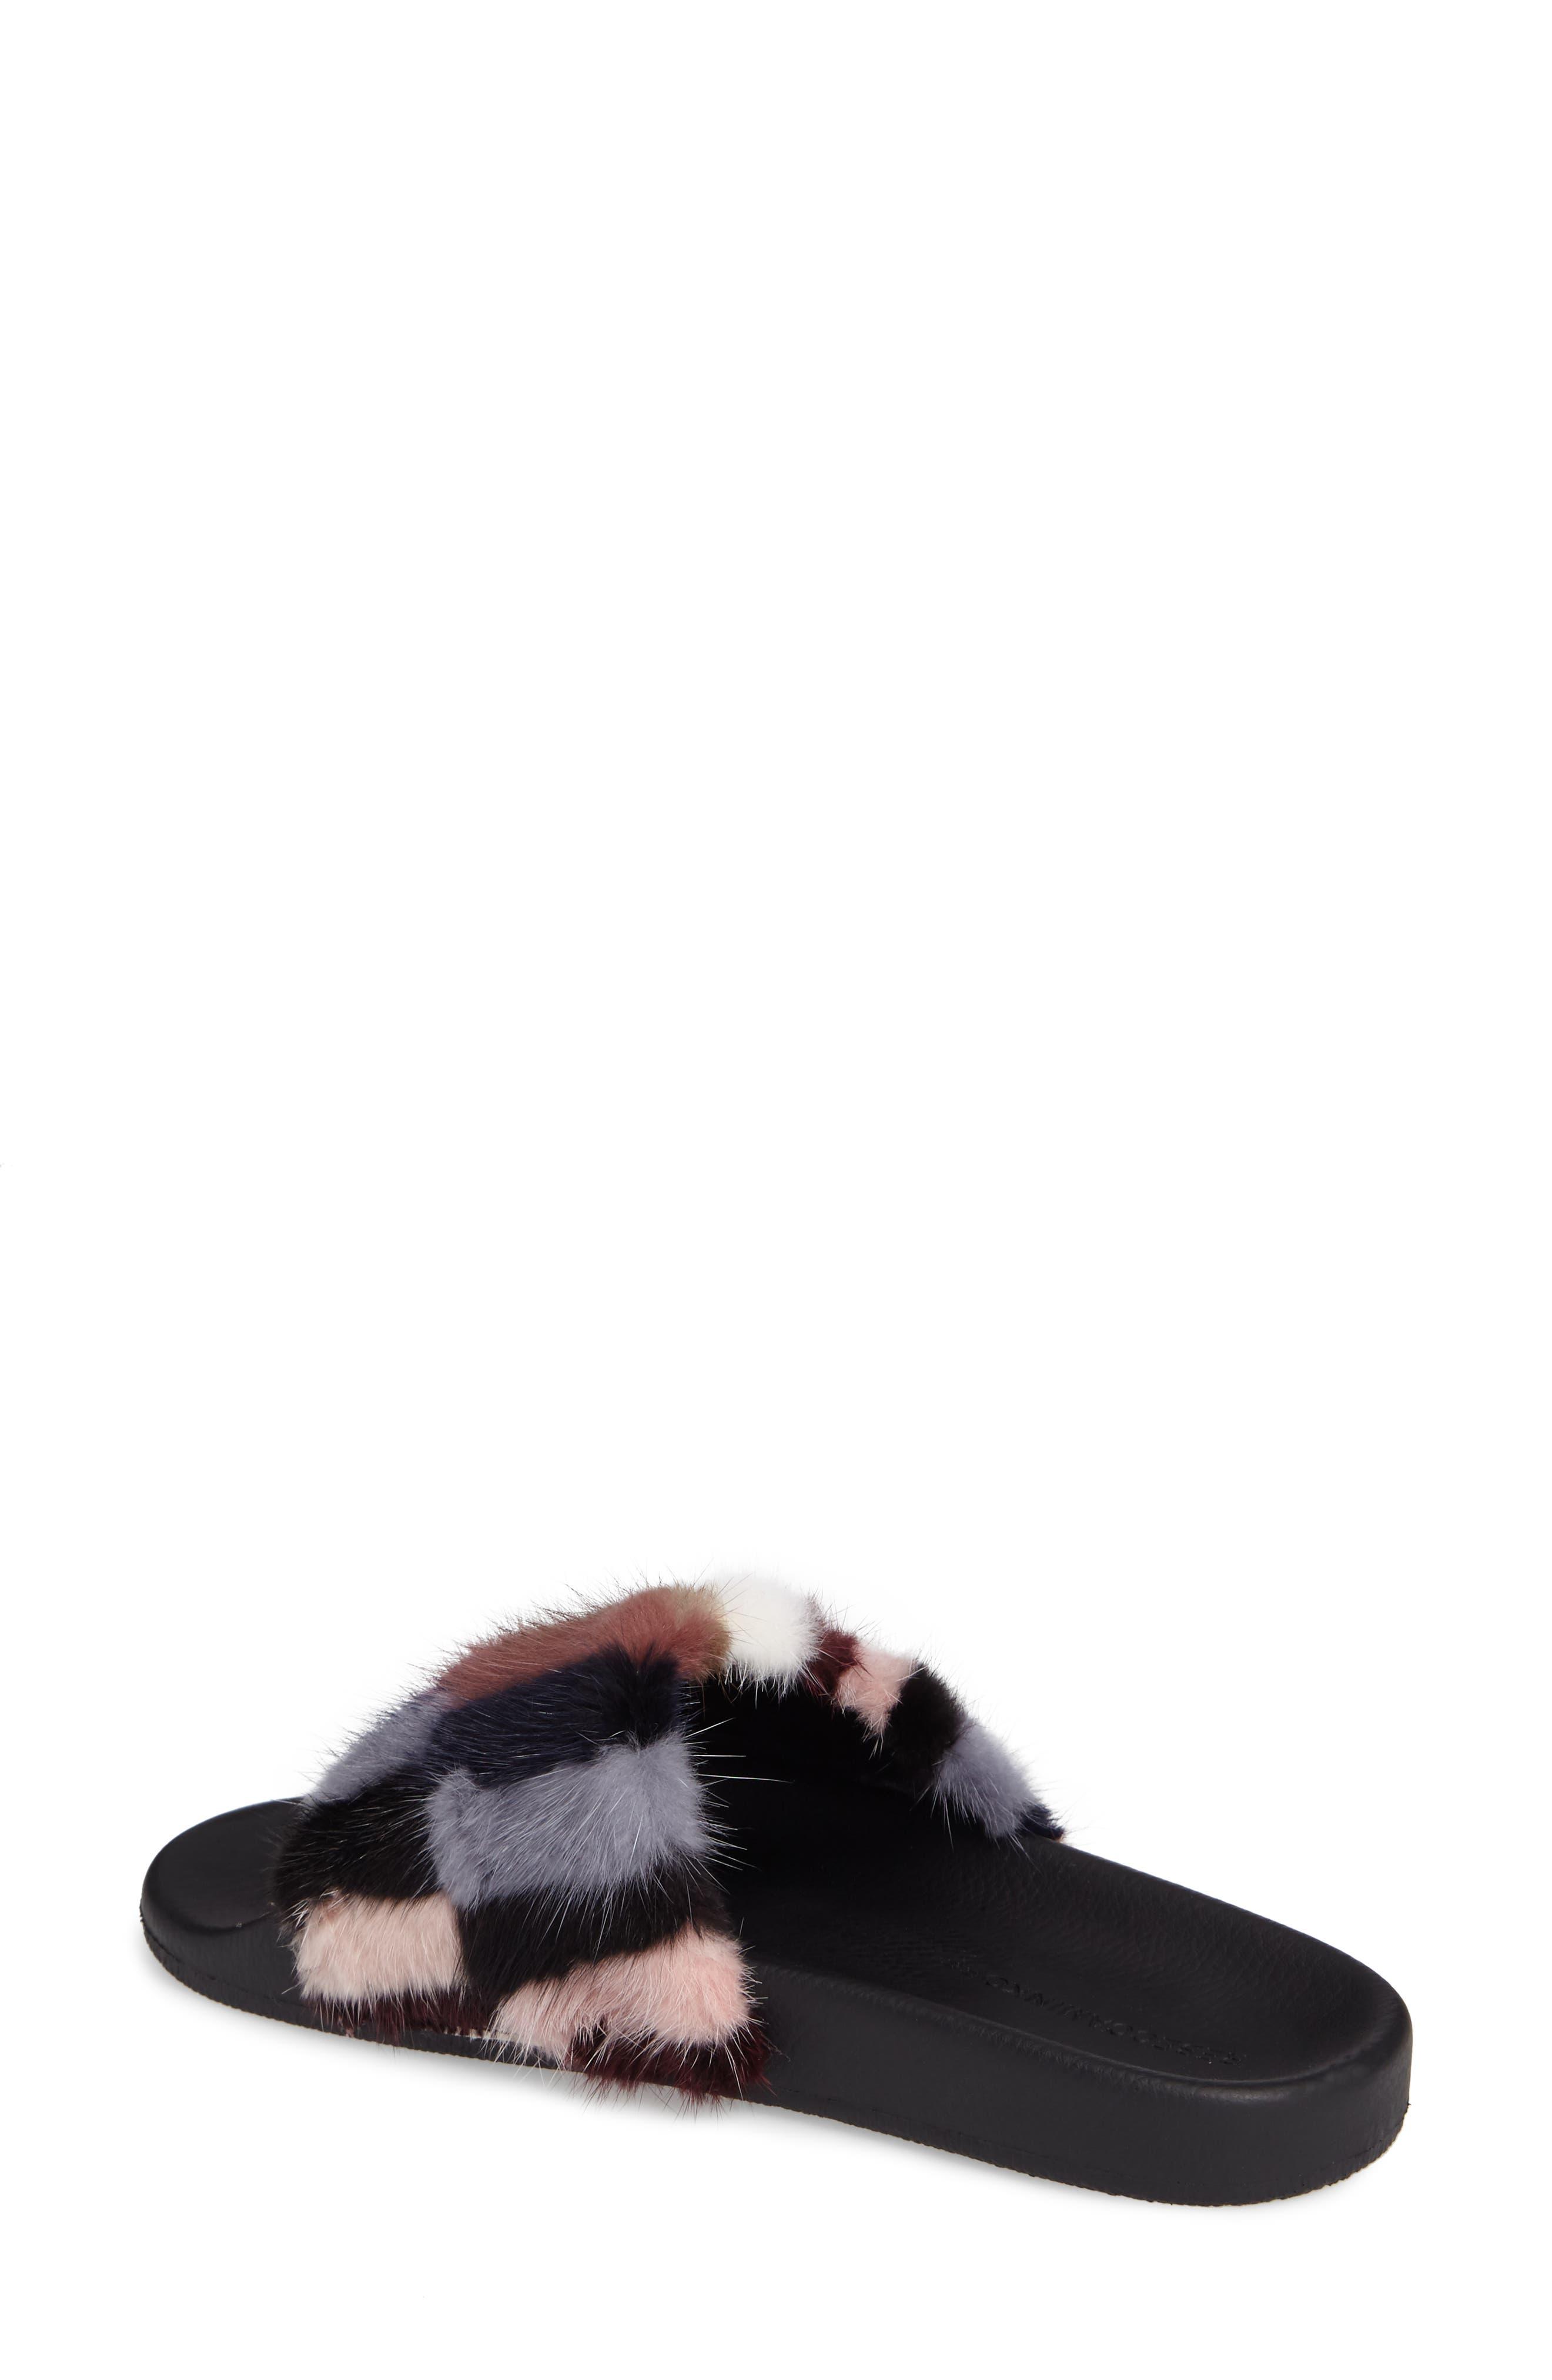 Sammi Genuine Fur Slide Sandal,                             Alternate thumbnail 2, color,                             Multi Fur